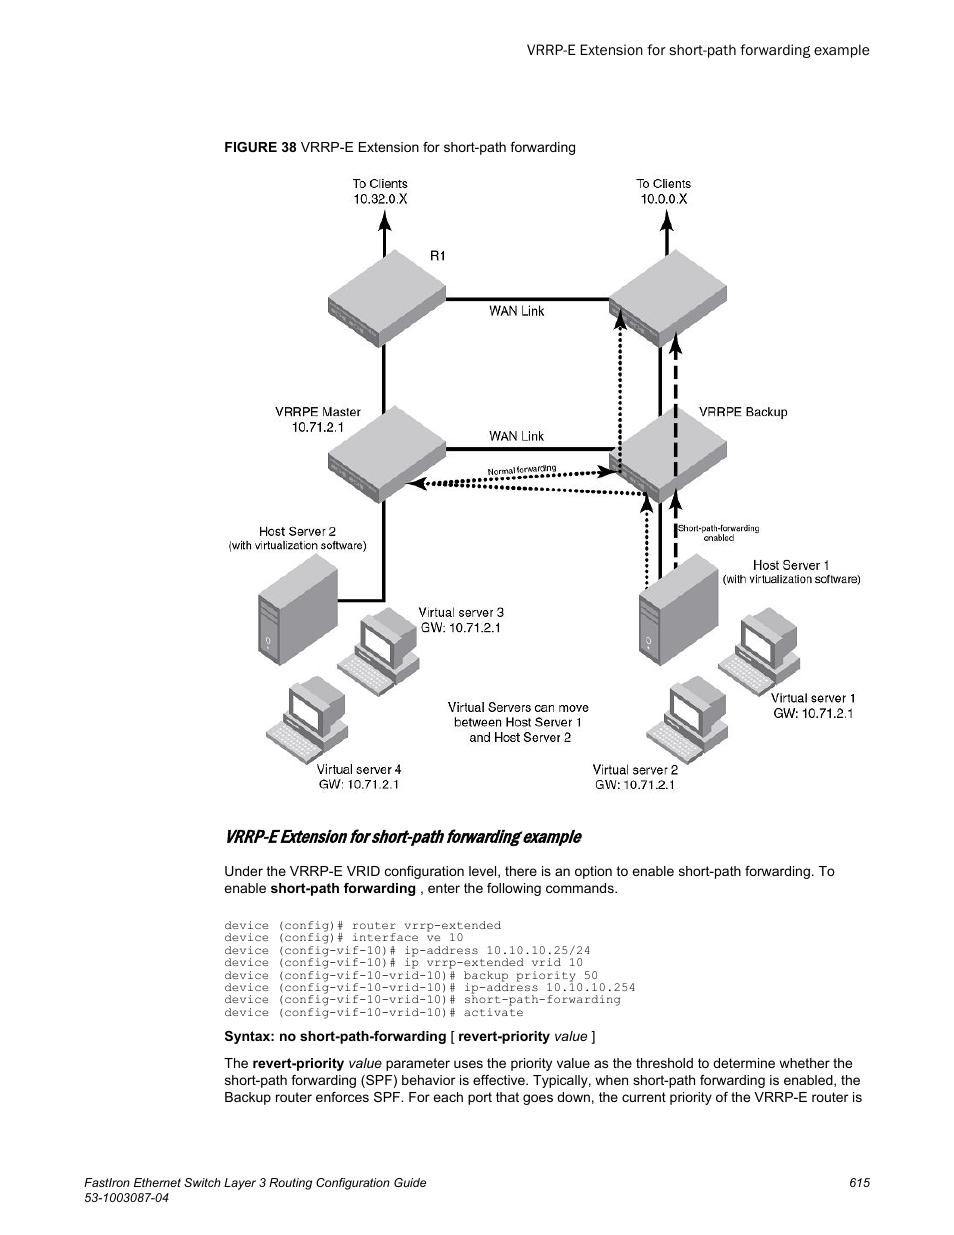 Vrrp-e extension for short-path forwarding example   Brocade